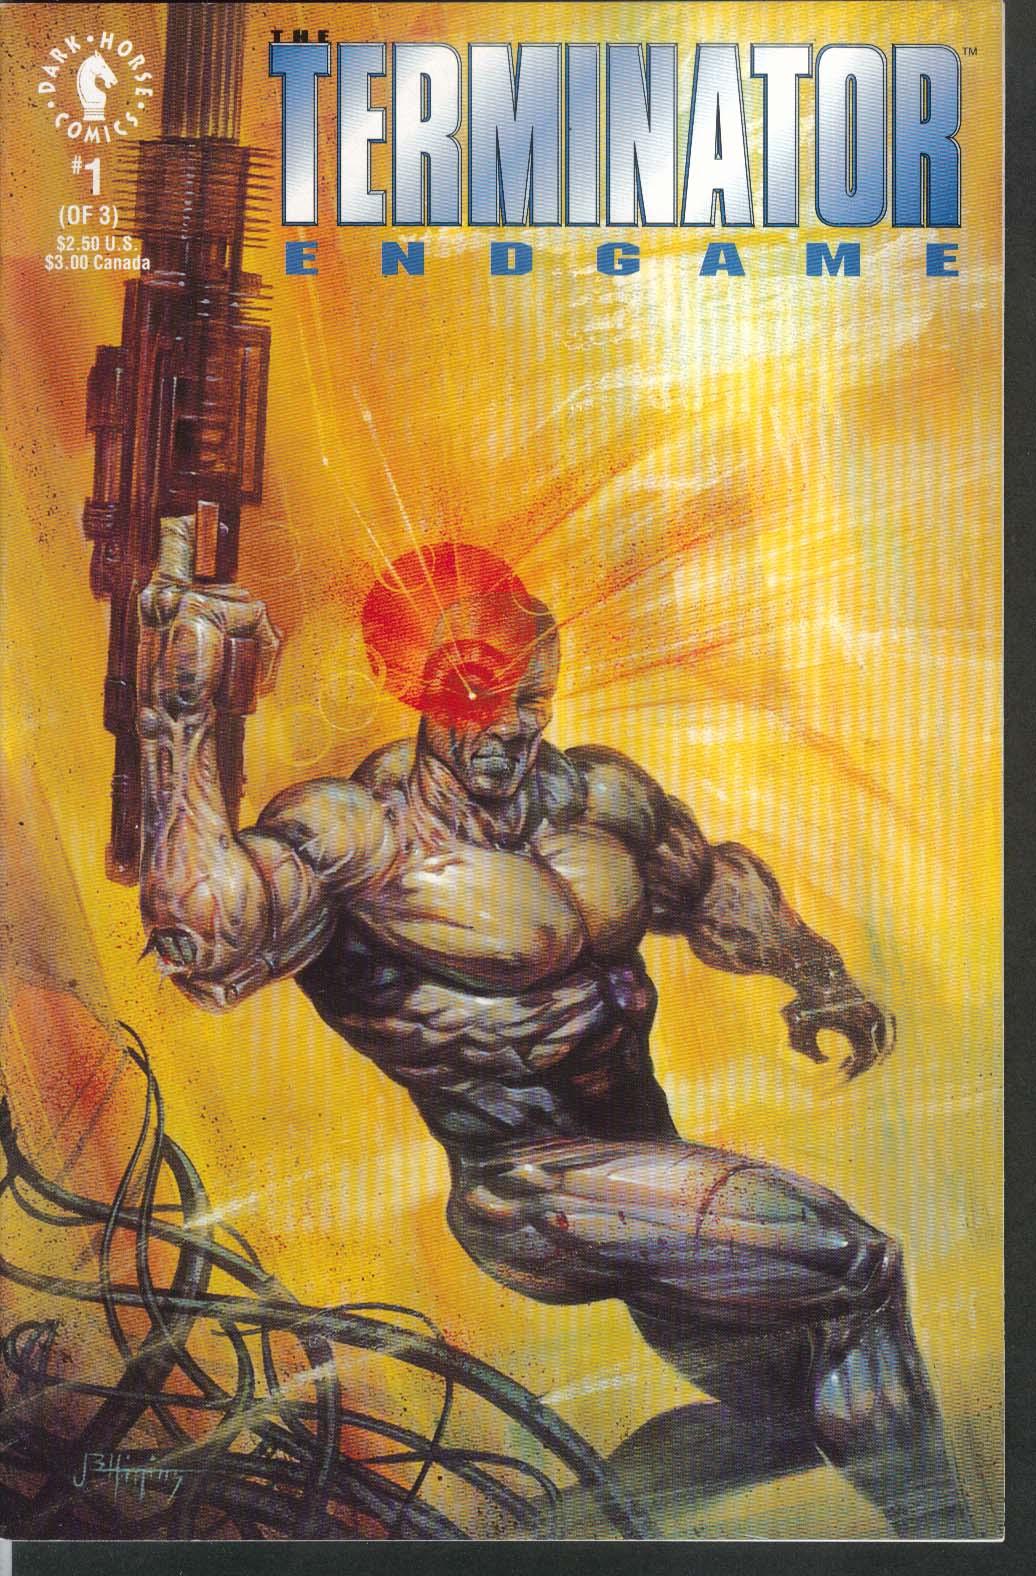 TERMINATOR ENDGAME #1 Dark Horse comic book 9 1992